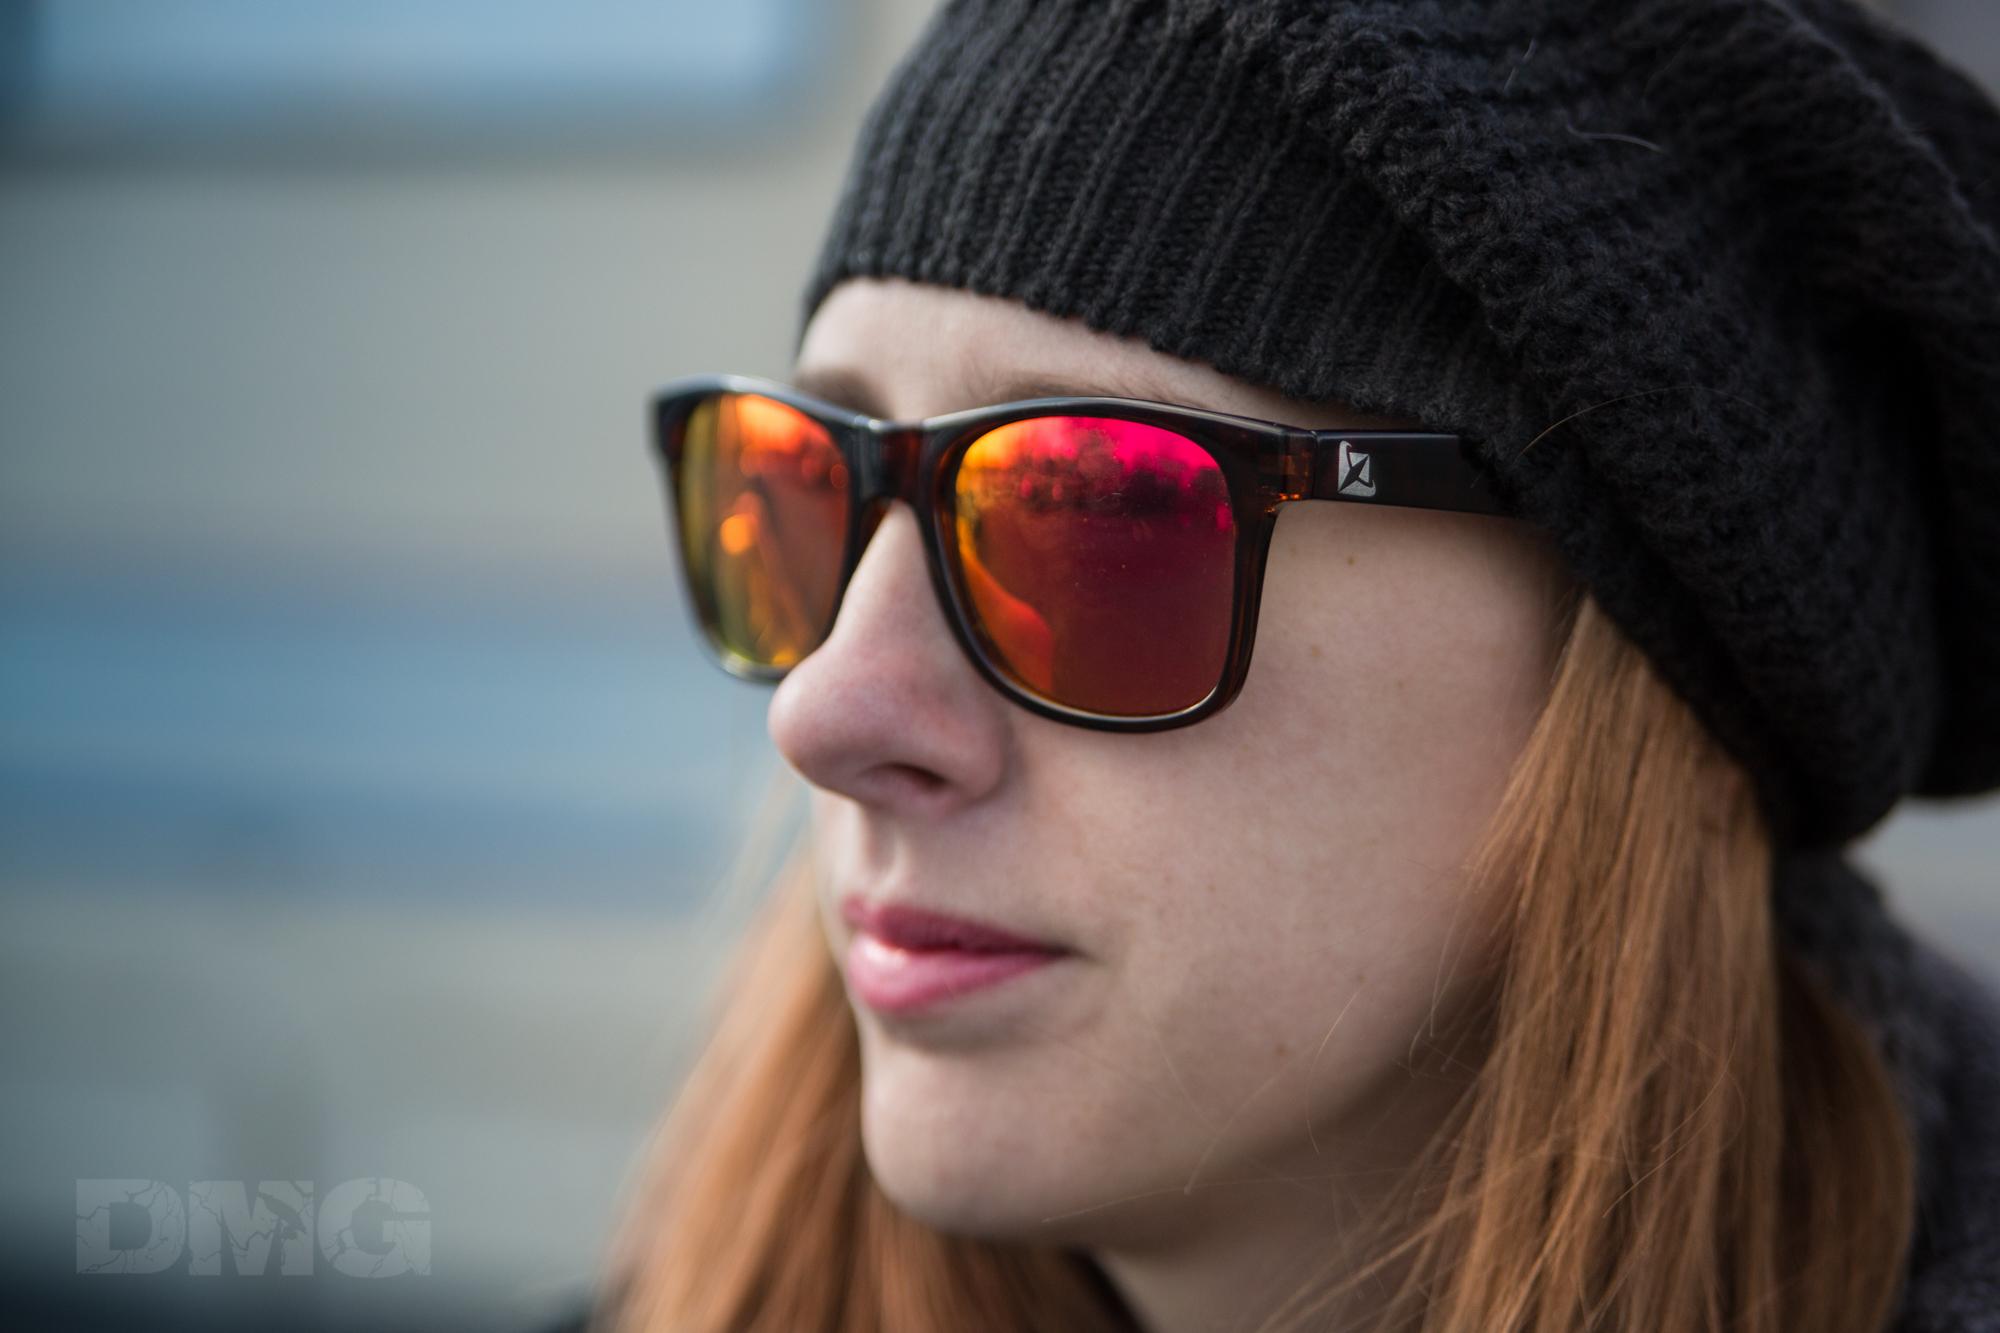 Torsion Apparel - Lenardon Red Sunglasses:  http://www.torsion.co/